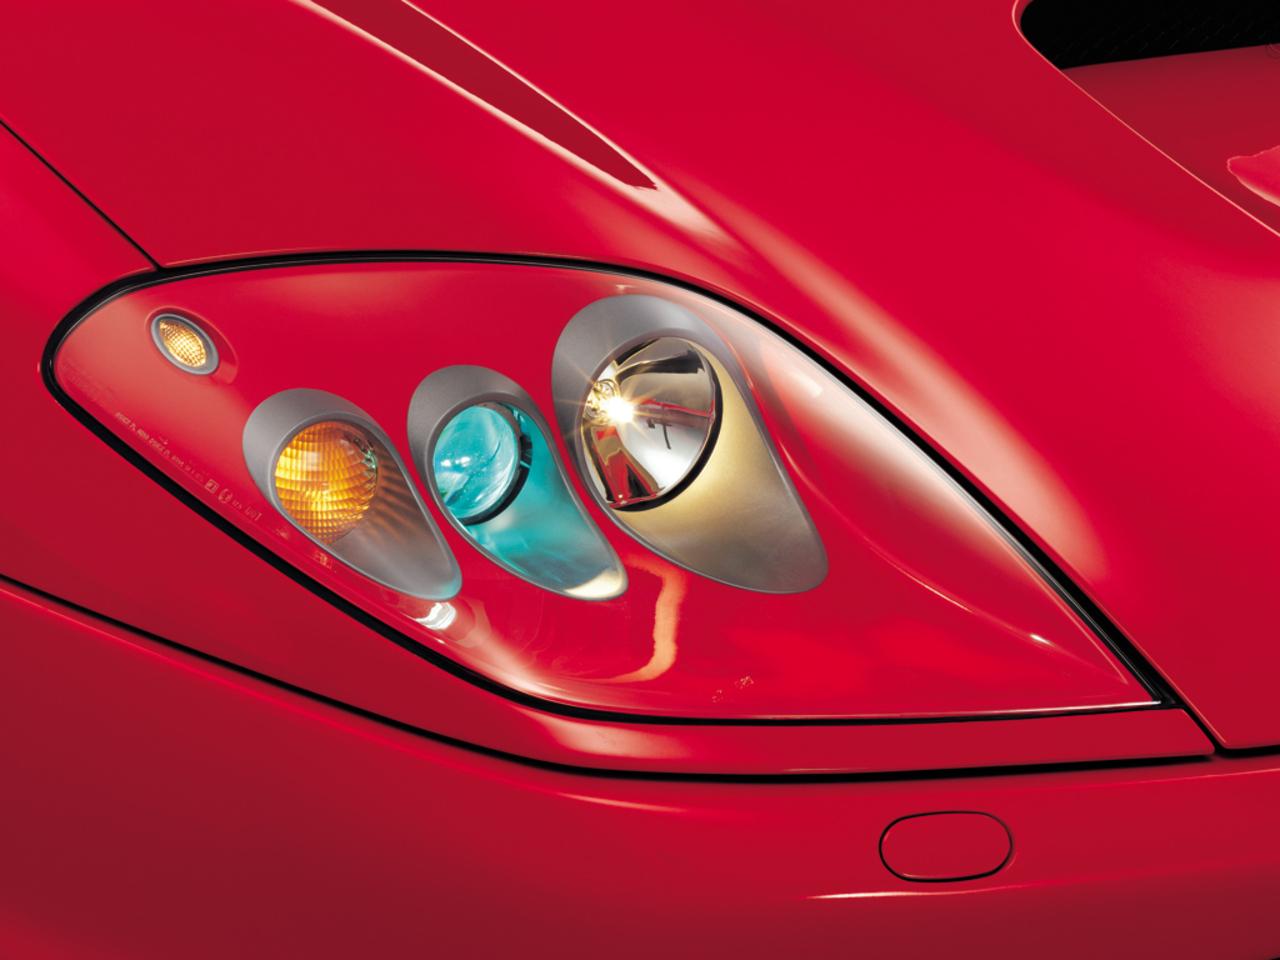 575M Maranello, front light